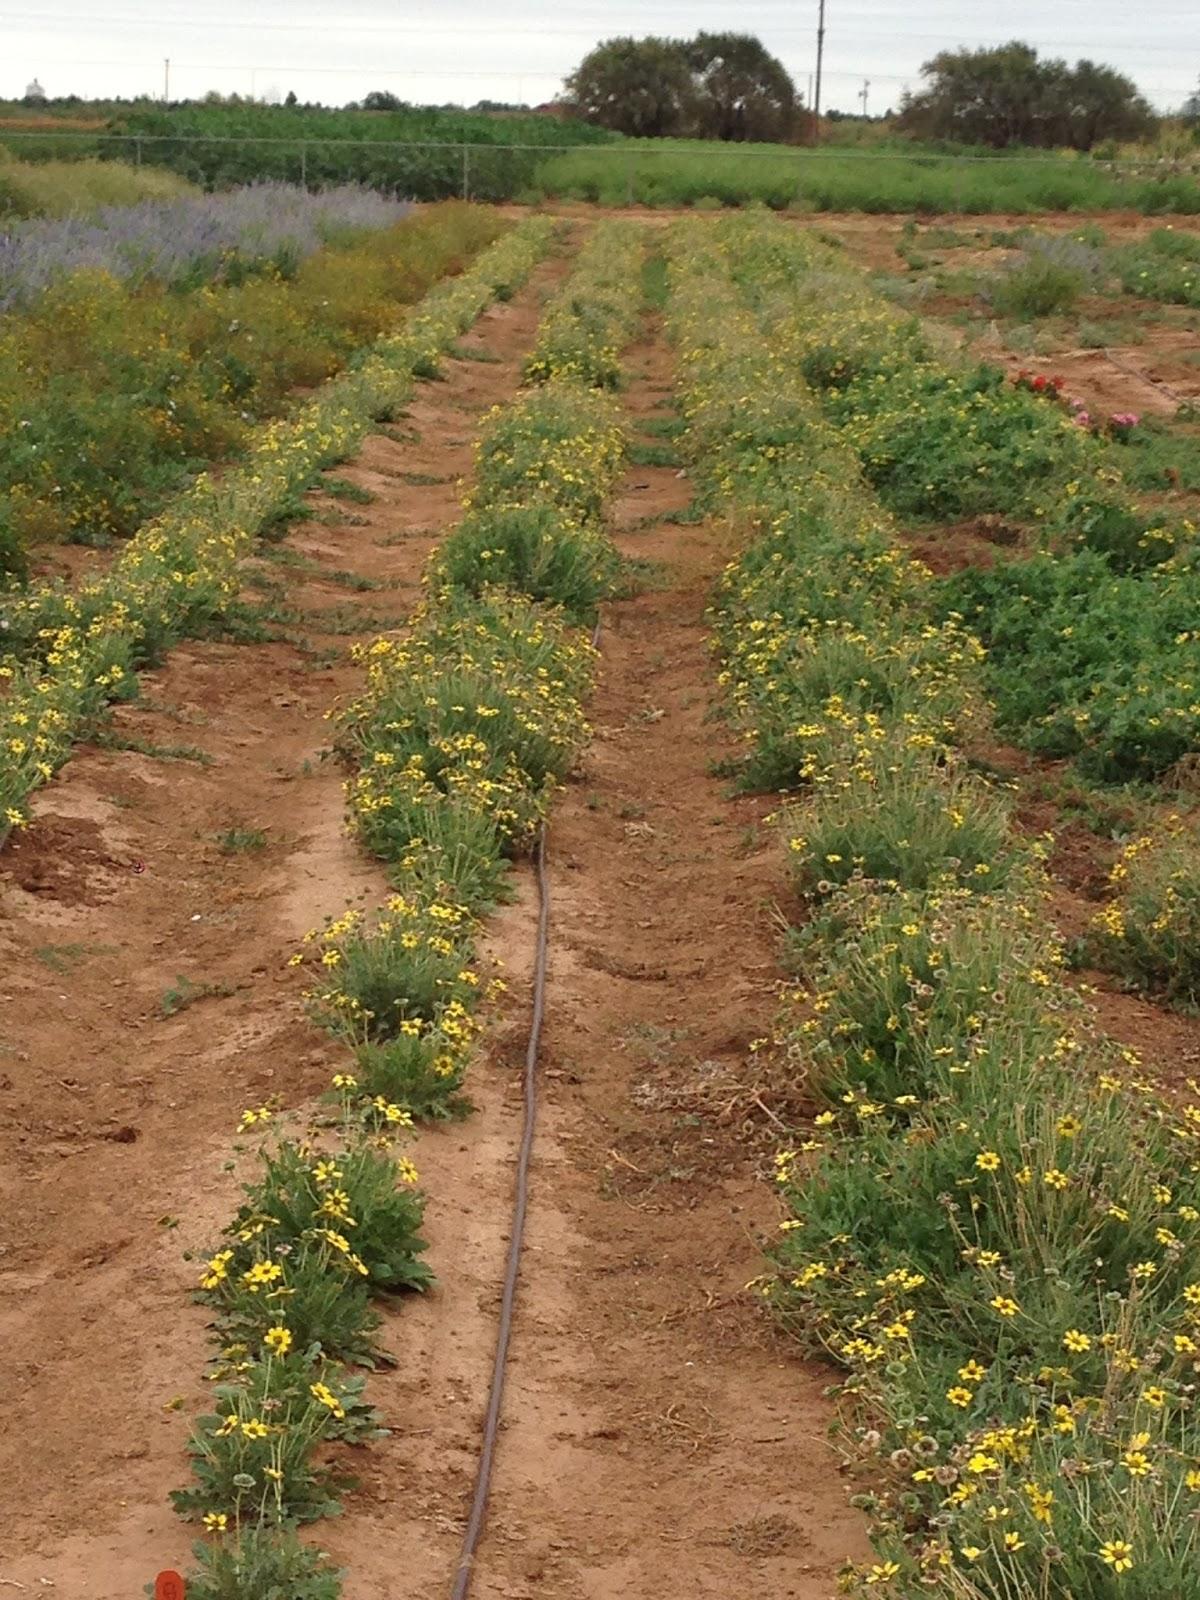 Spring Lawn Management 101: Fertilizer | Texas Tech